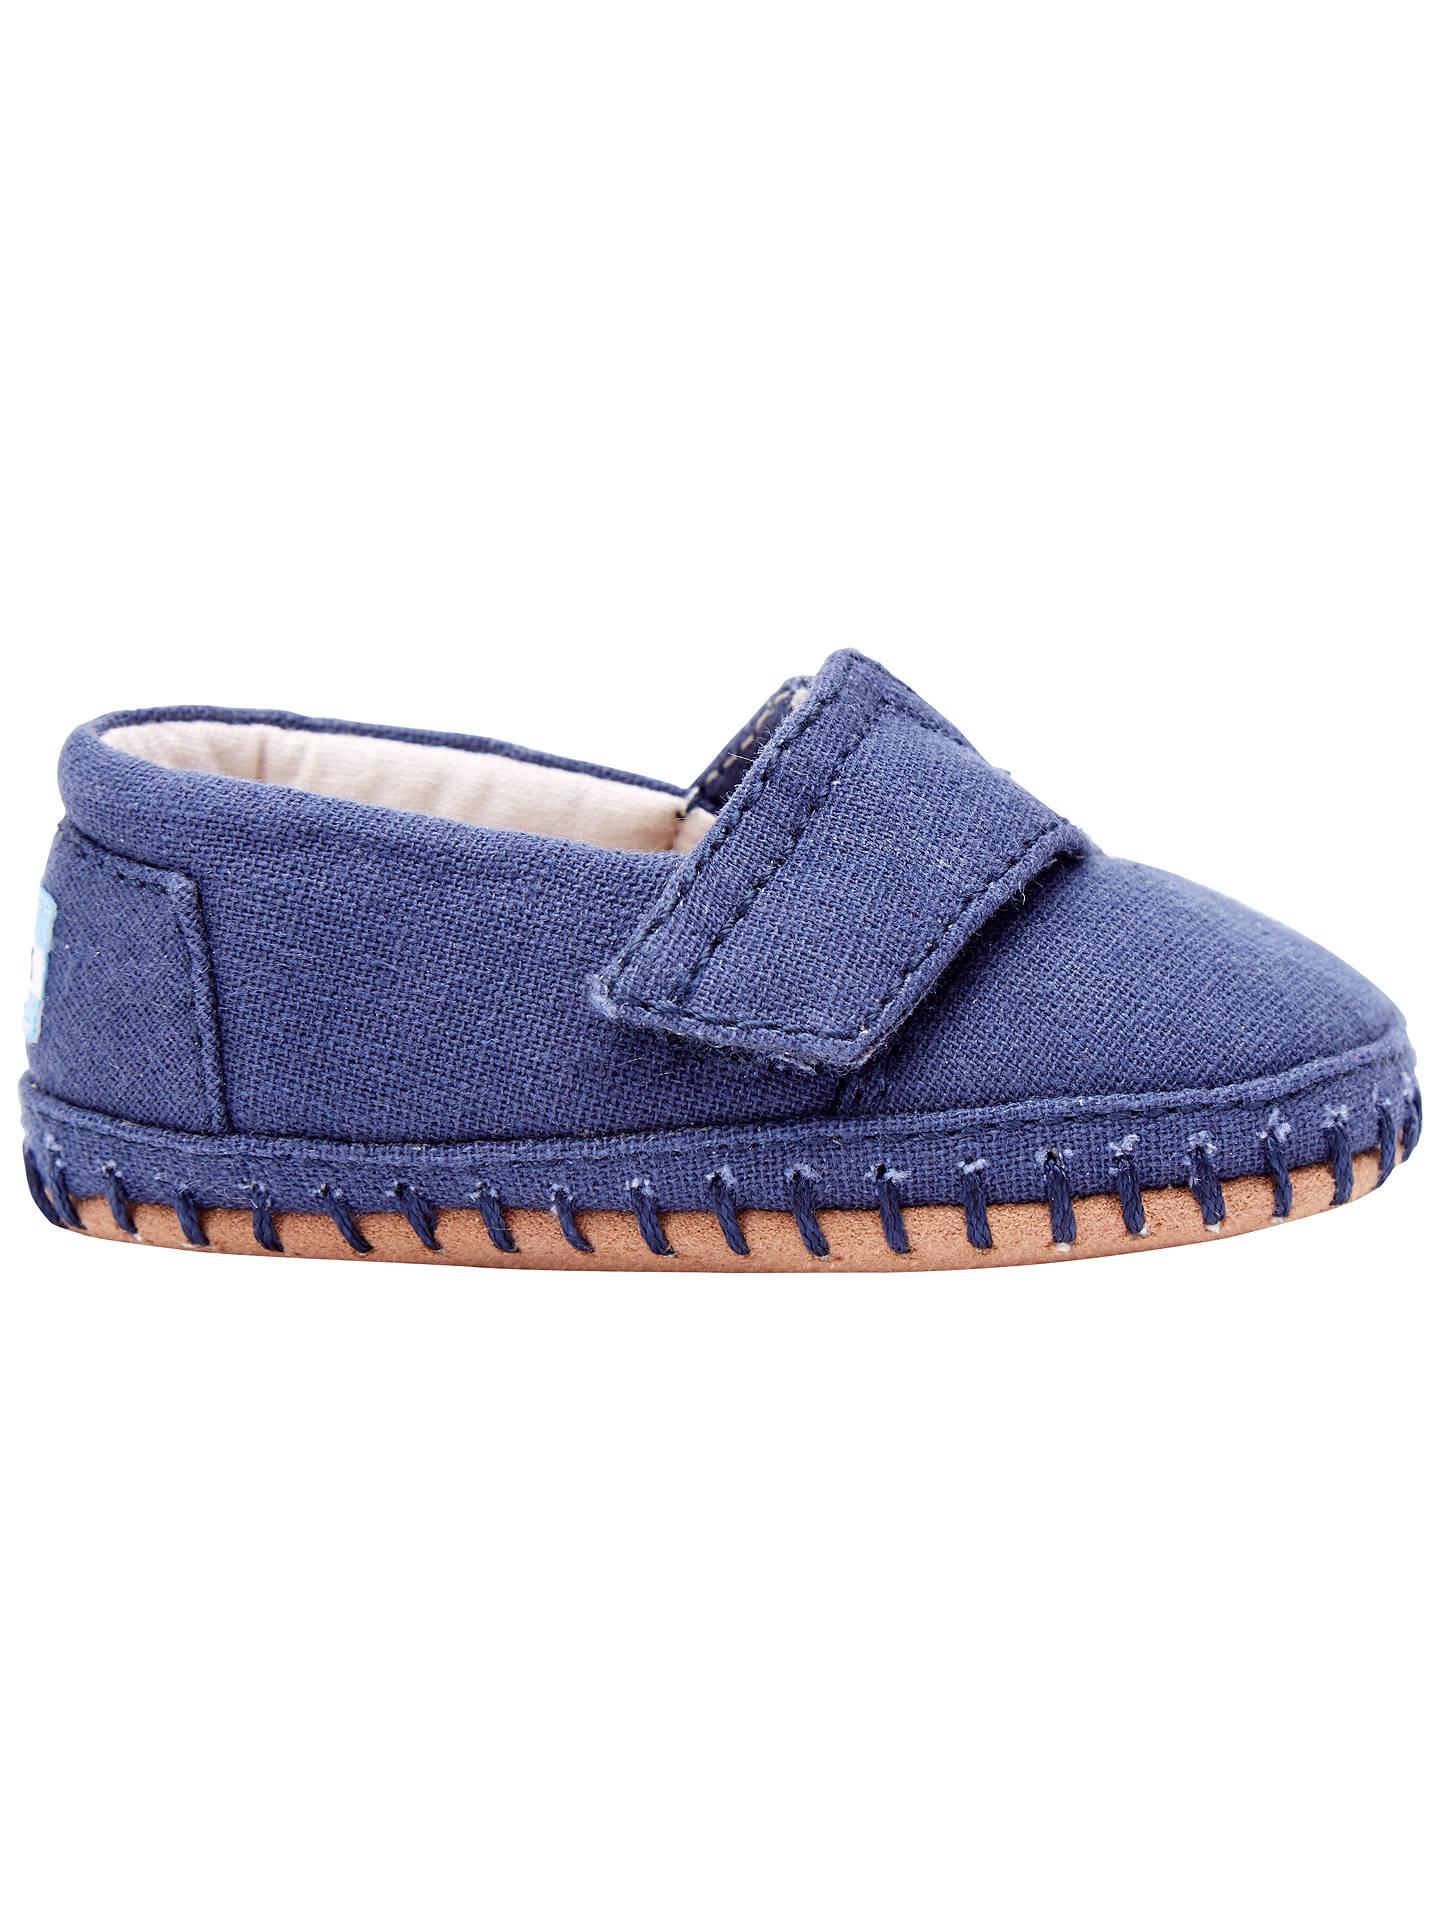 c05e9283663 Buy TOMS Children s Canvas Crib Alpargata Shoes